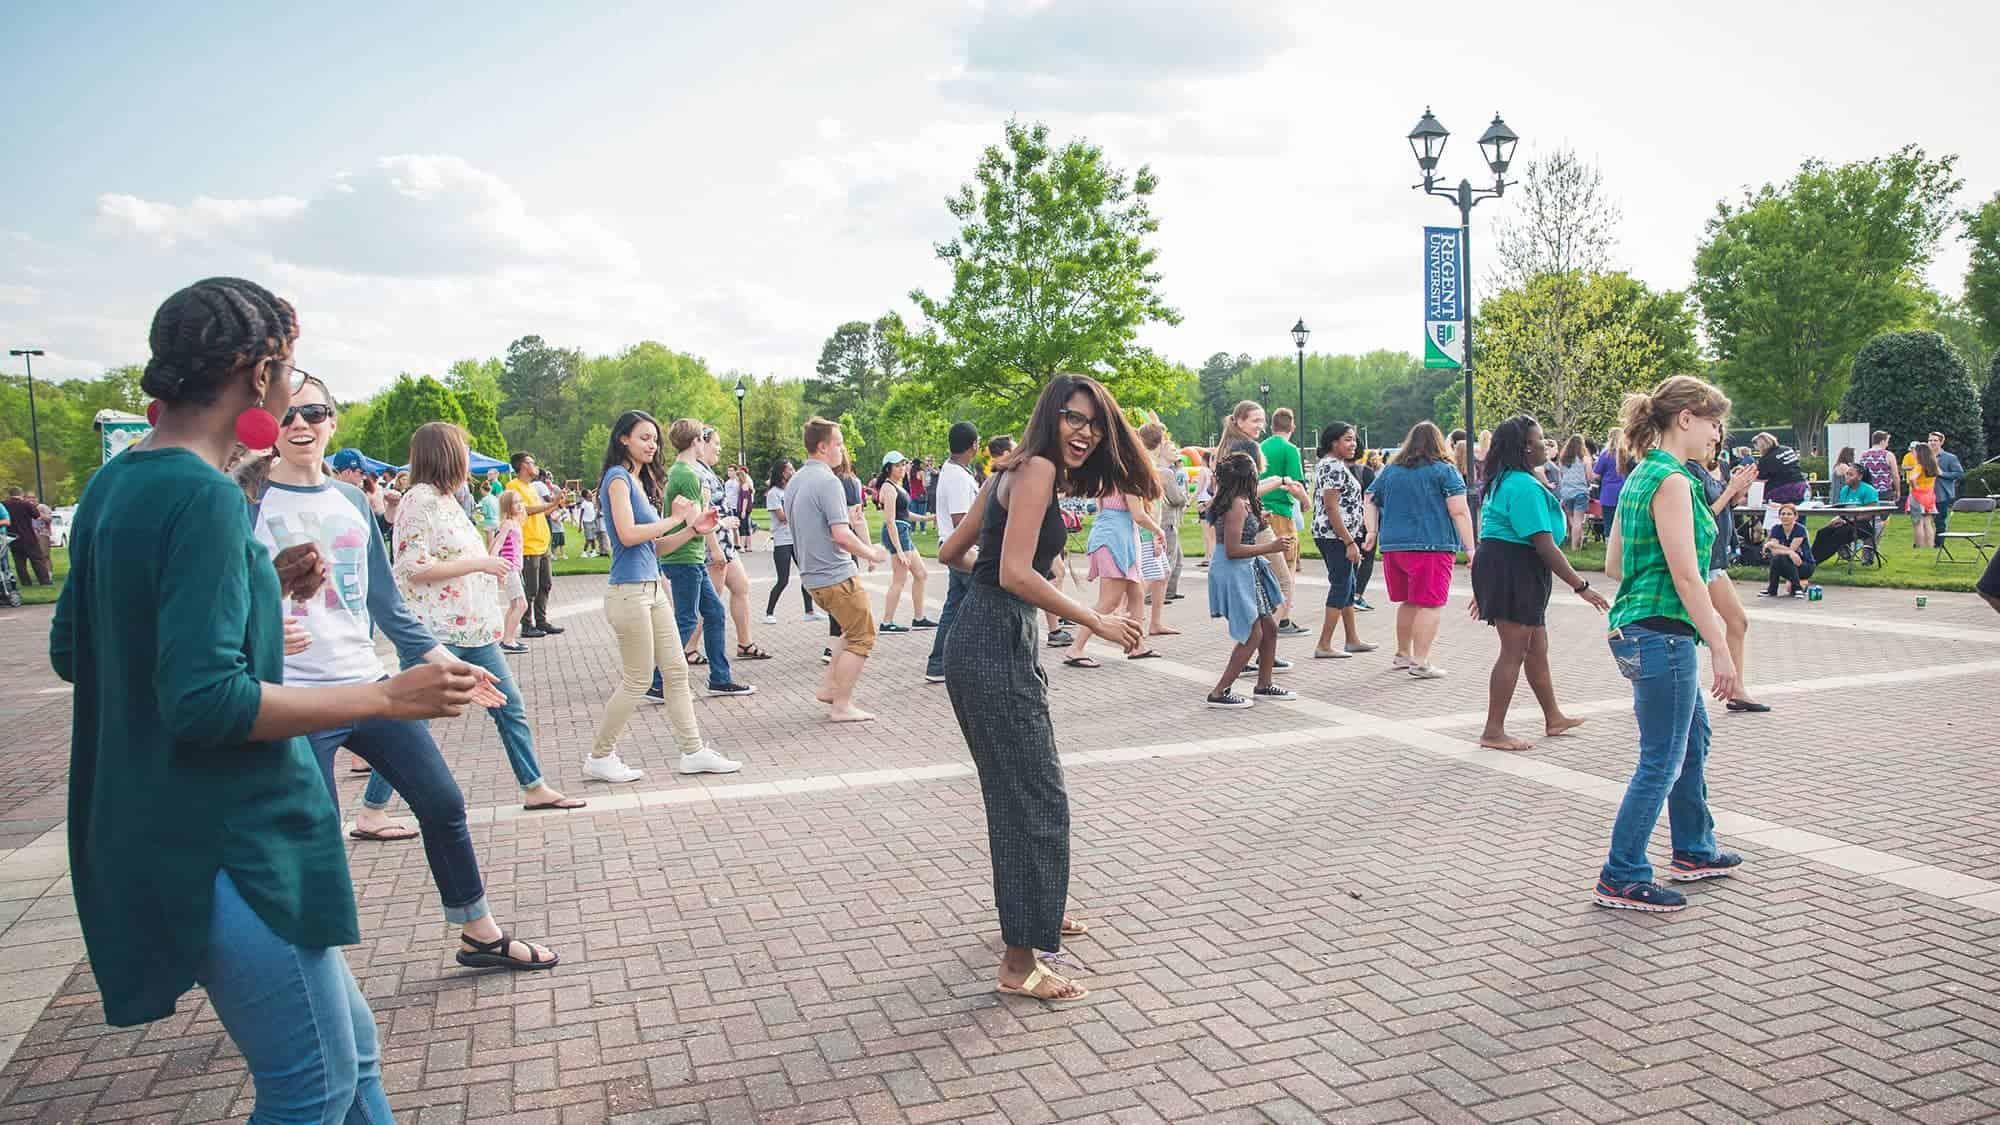 Students dance during an event at Regent University, Virginia Beach.